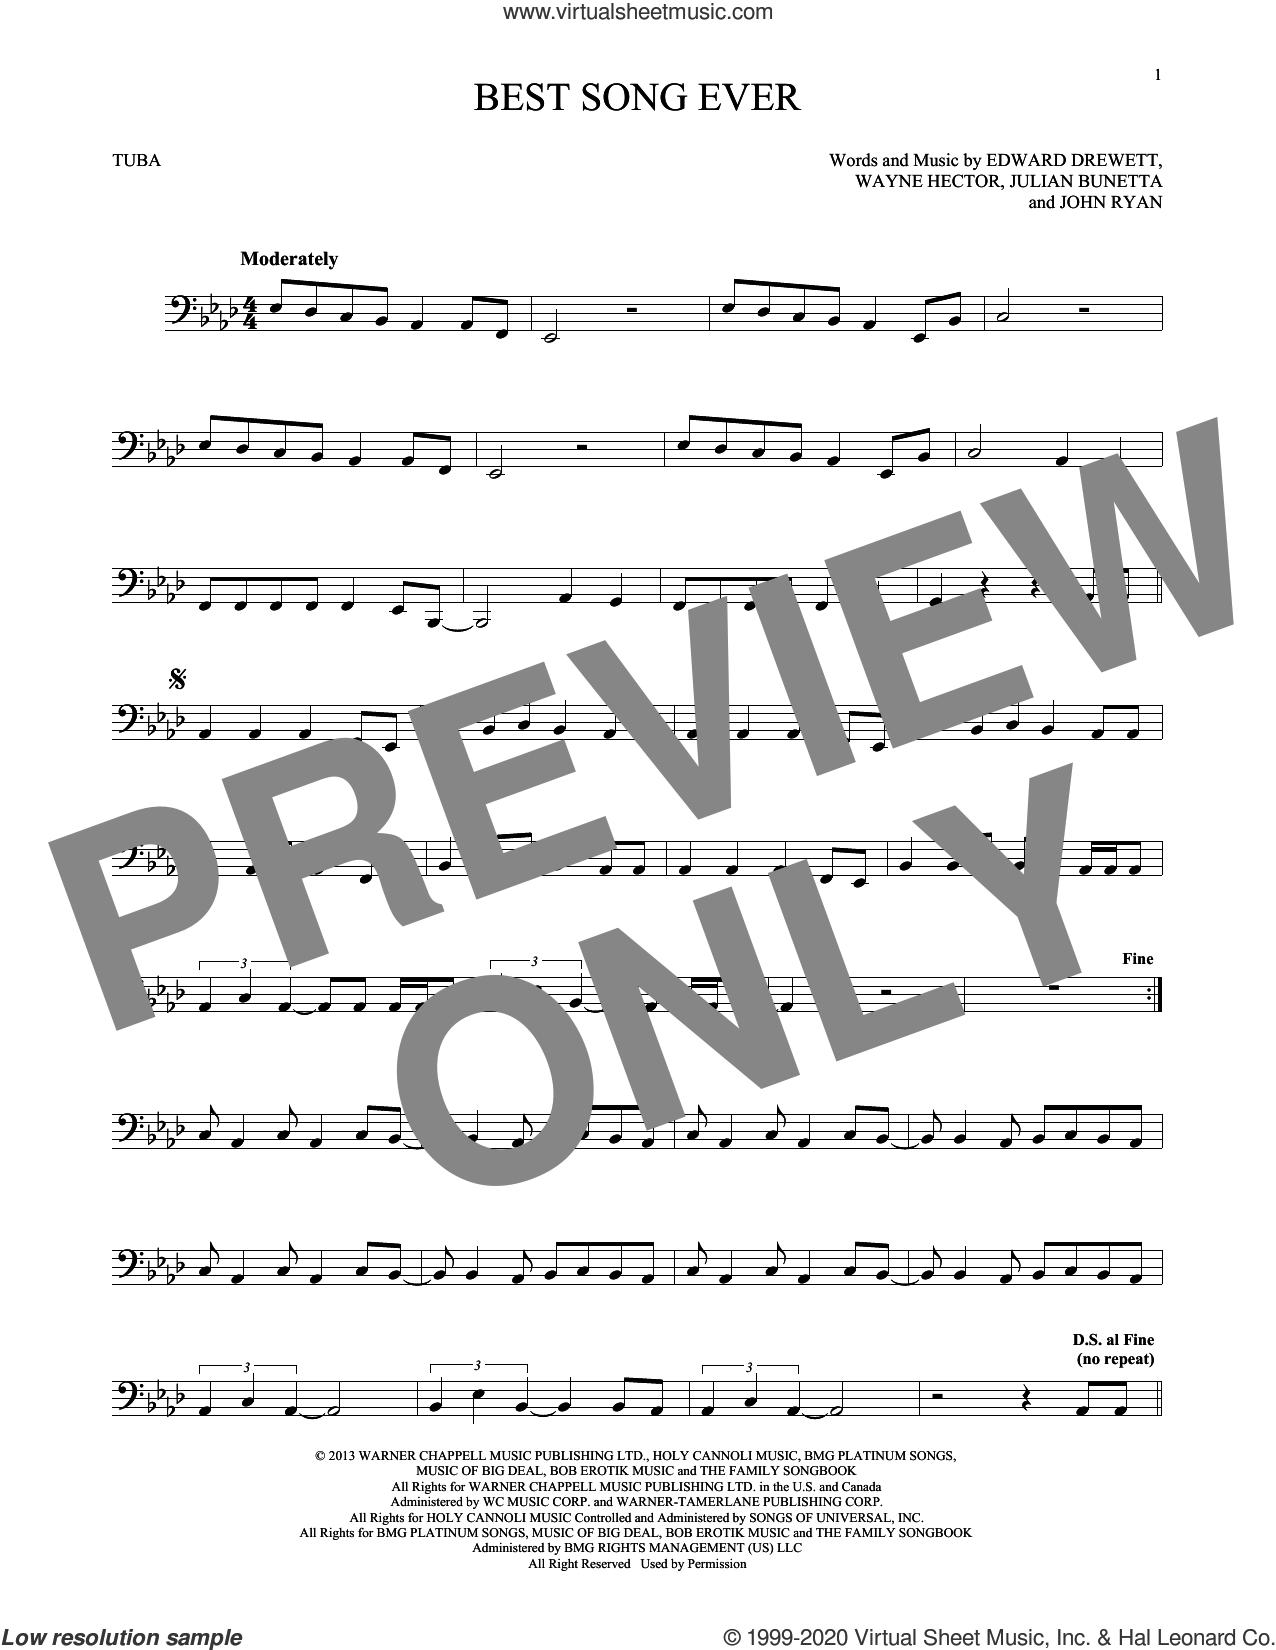 Best Song Ever sheet music for Tuba Solo (tuba) by One Direction, Edward Drewett, John Ryan, Julian Bunetta and Wayne Hector, intermediate skill level